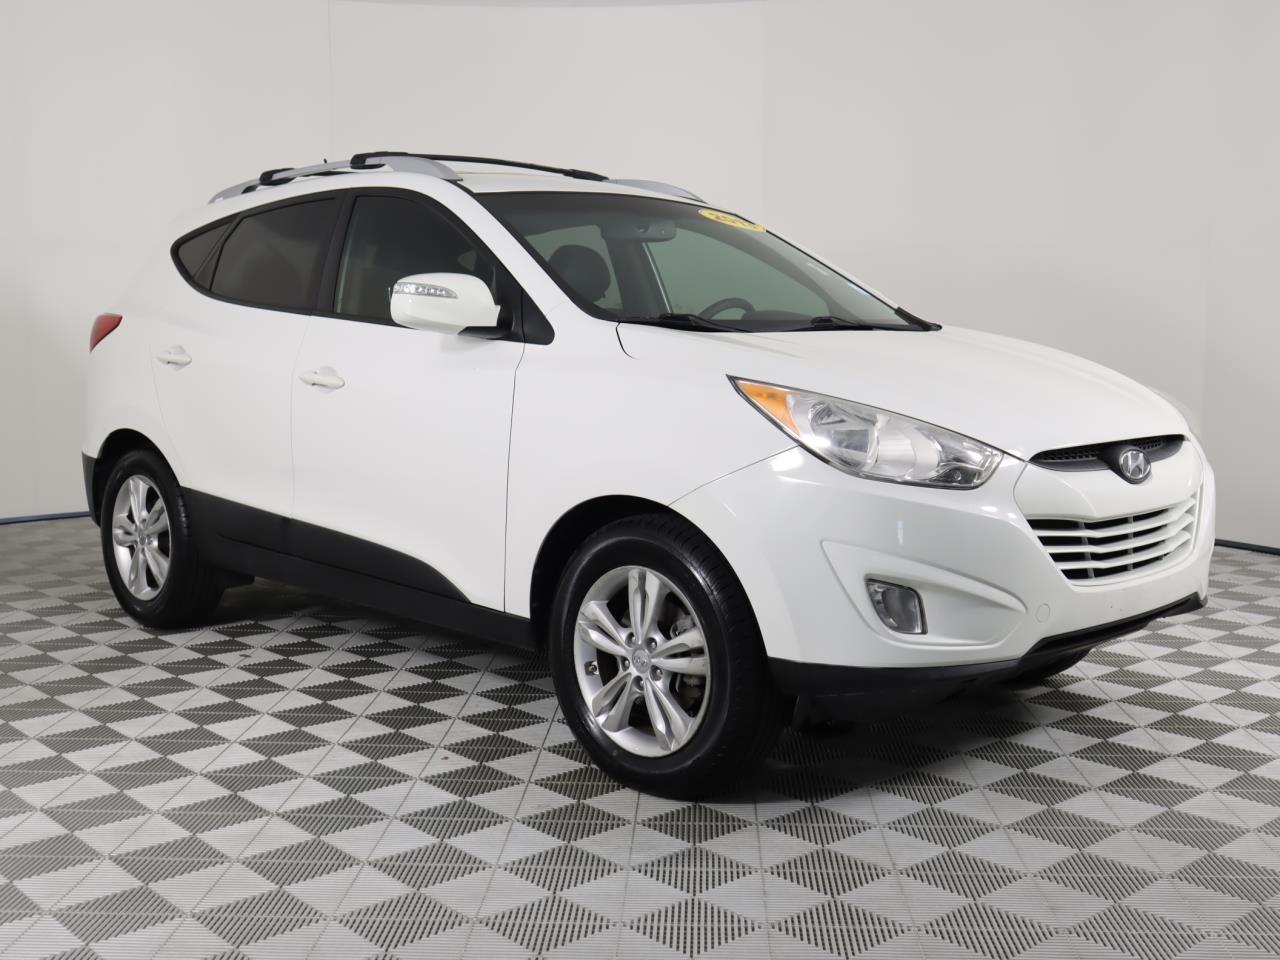 2013 HYUNDAI TUCSON FWD 4dr Auto GLS 33839 miles 2 front 12V pwr outlet 4 assist grips 6